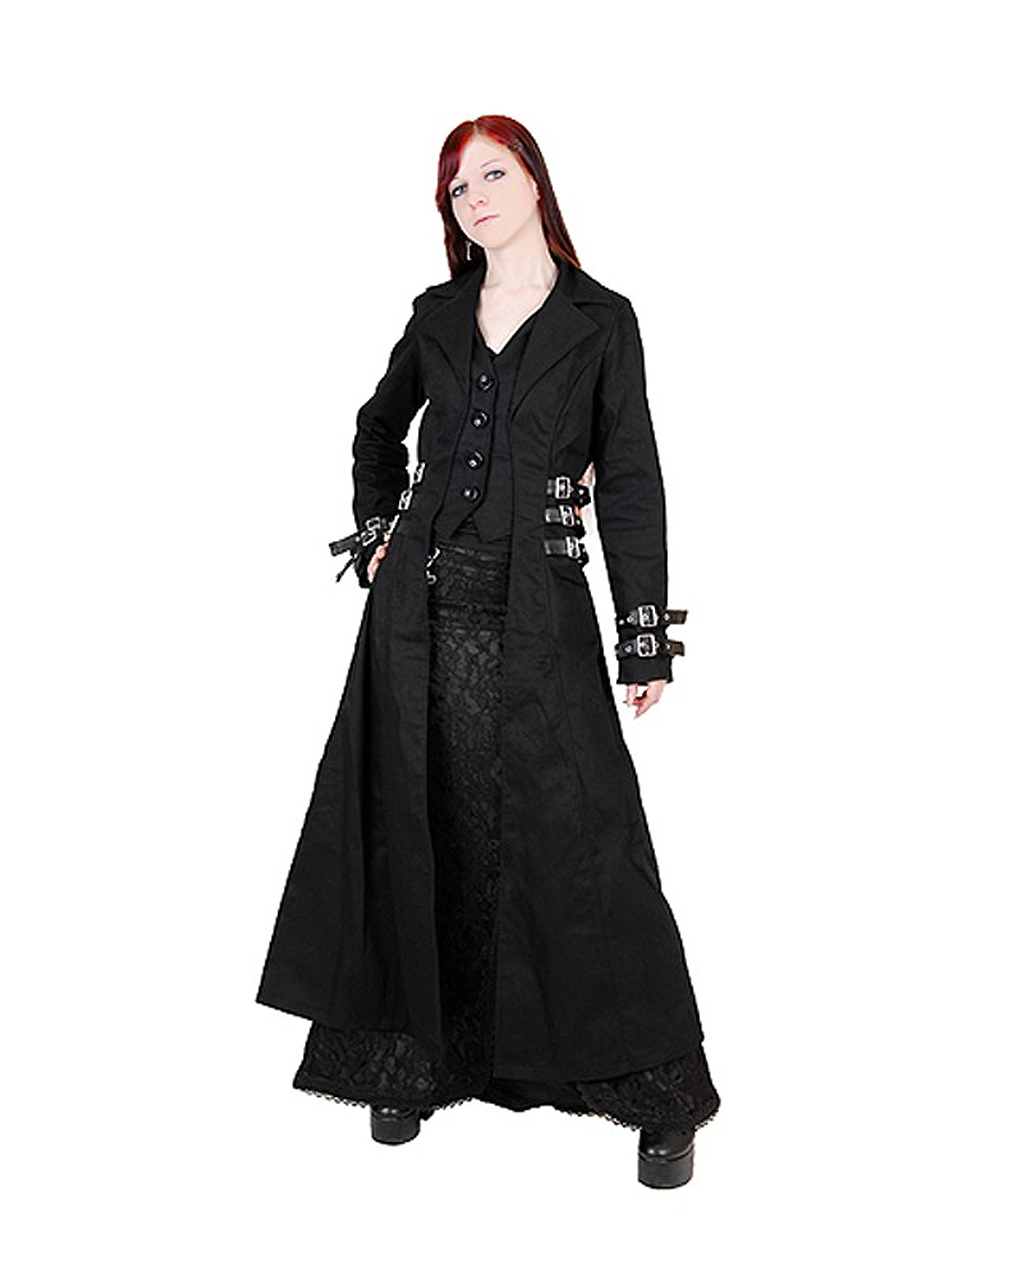 damen mantel mit schnallen als gothic mode karneval universe. Black Bedroom Furniture Sets. Home Design Ideas